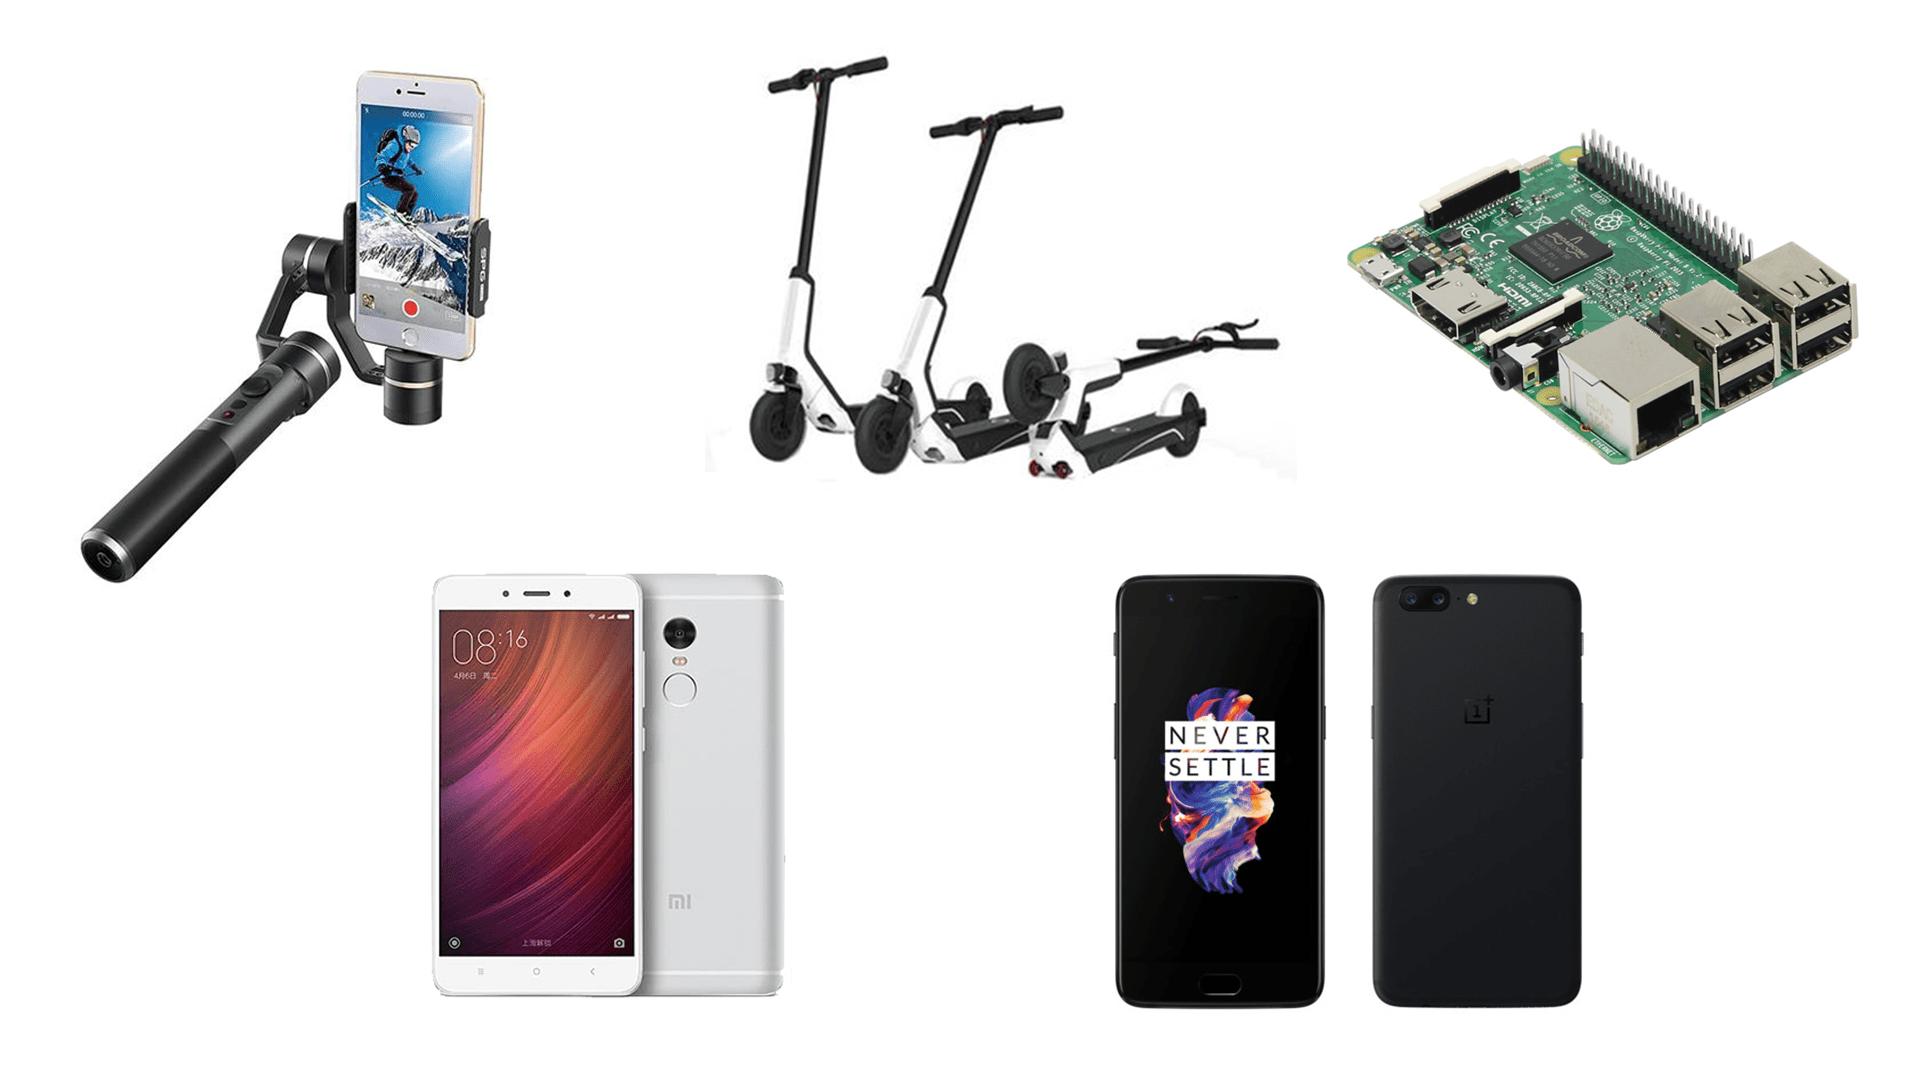 5 offres de la semaine sur GearBest : Raspberry Pi 3, Feiyu Tech SPG, Xiaomi EUNI ES808, Xiaomi Redmi Note 4 et OnePlus 5